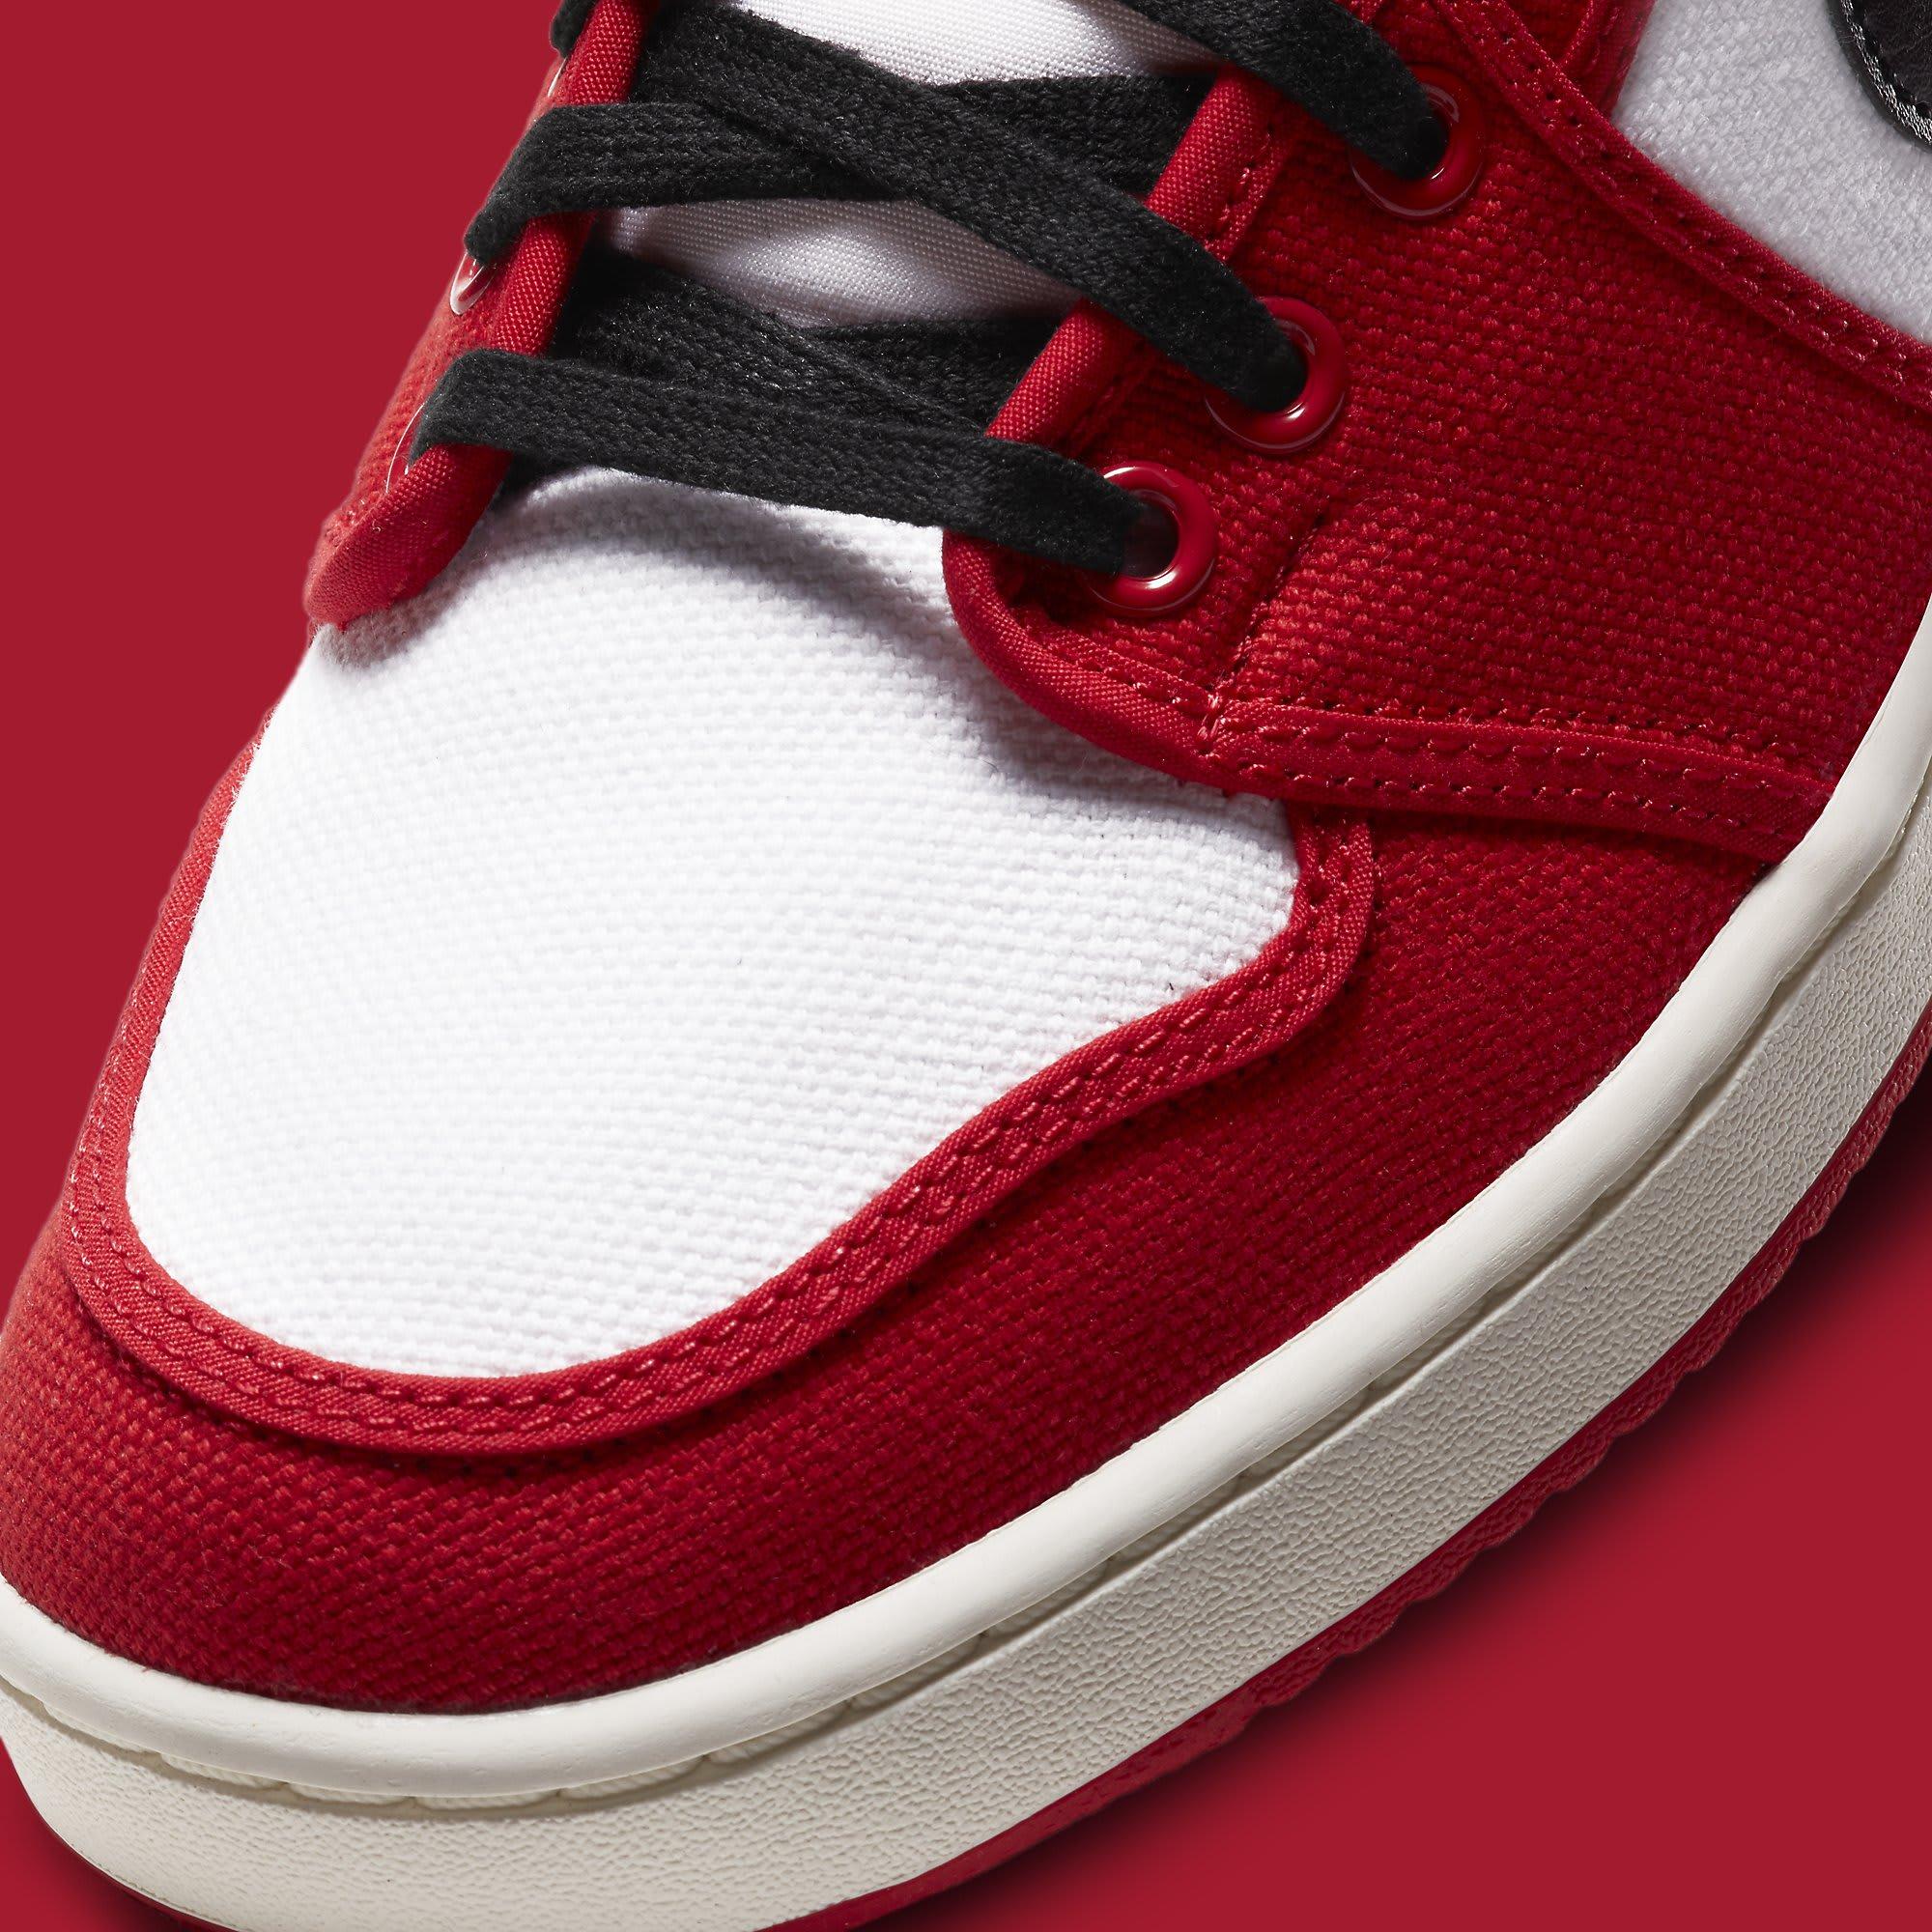 Air Jordan 1 KO Chicago 2021 Release Date DA9089-100 Toe Detail